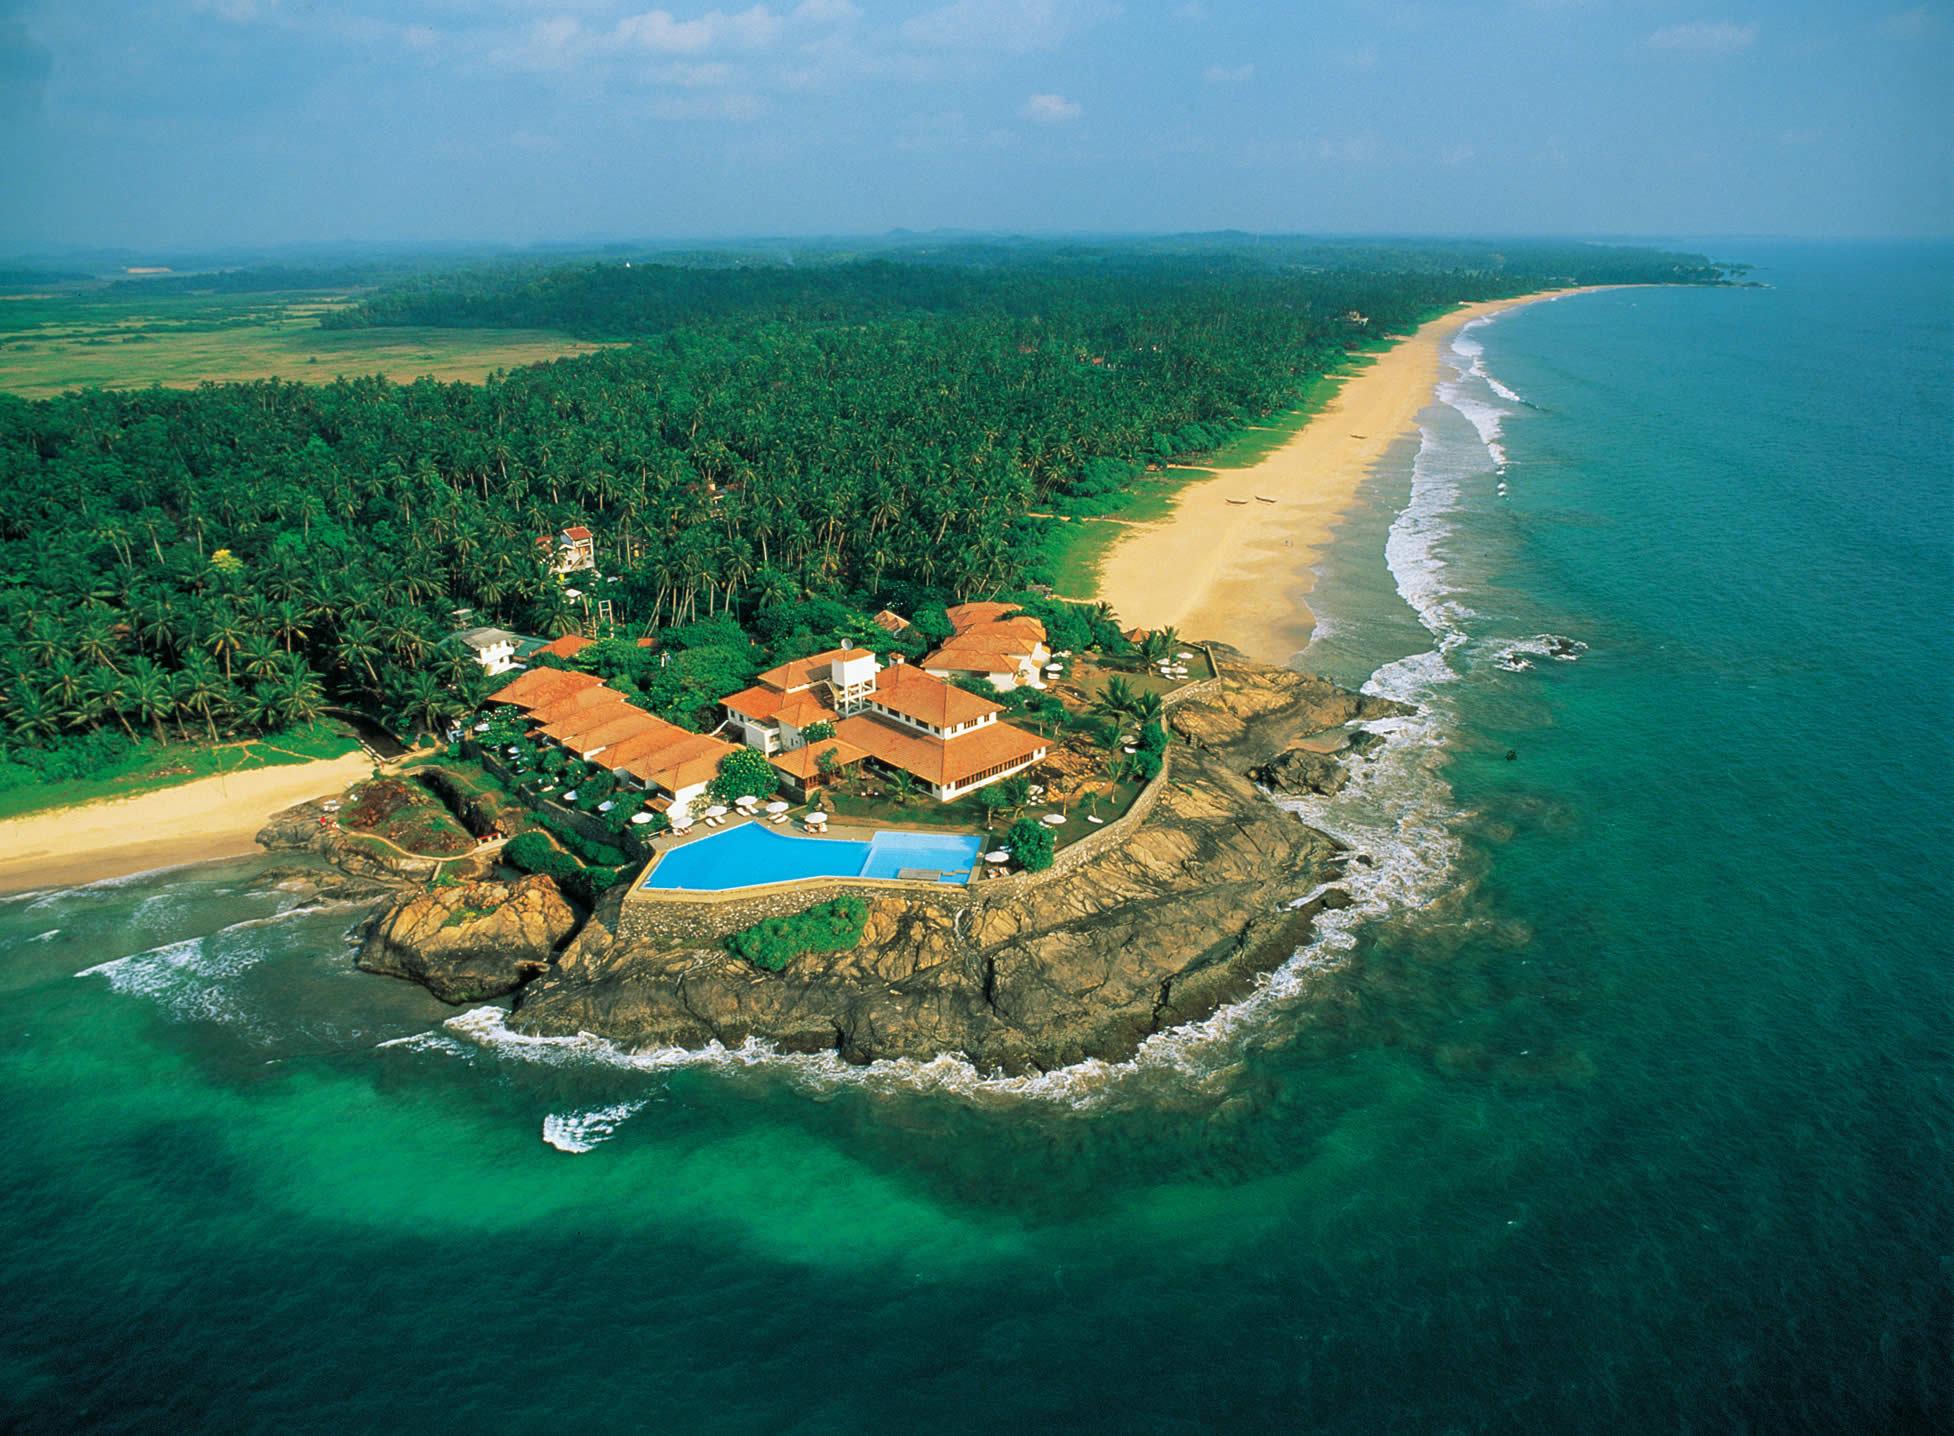 Sri Lanka High Definition Wallpapers